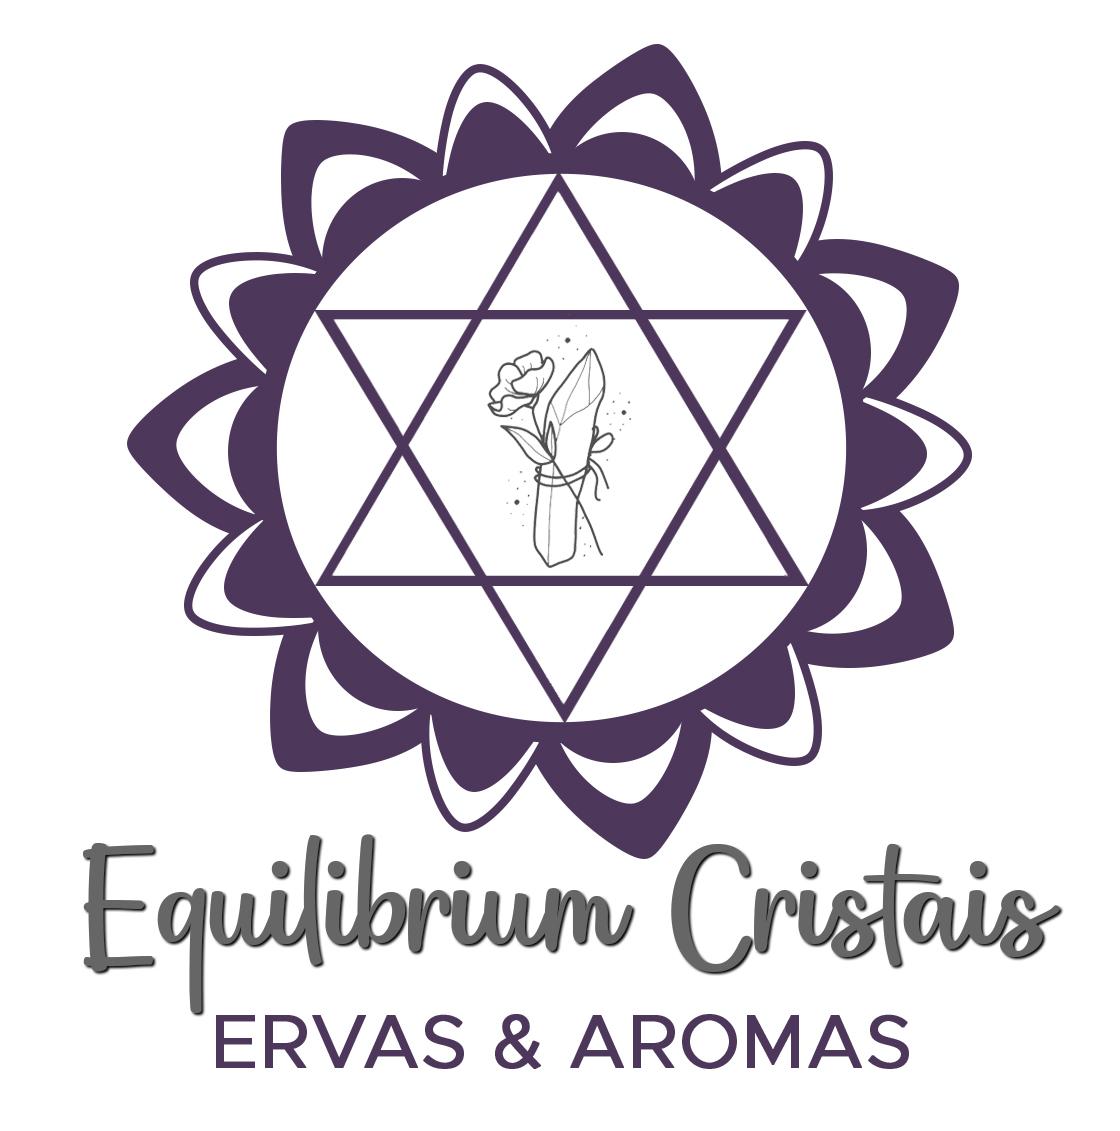 Equilibrium Cristais, Ervas e Aromas